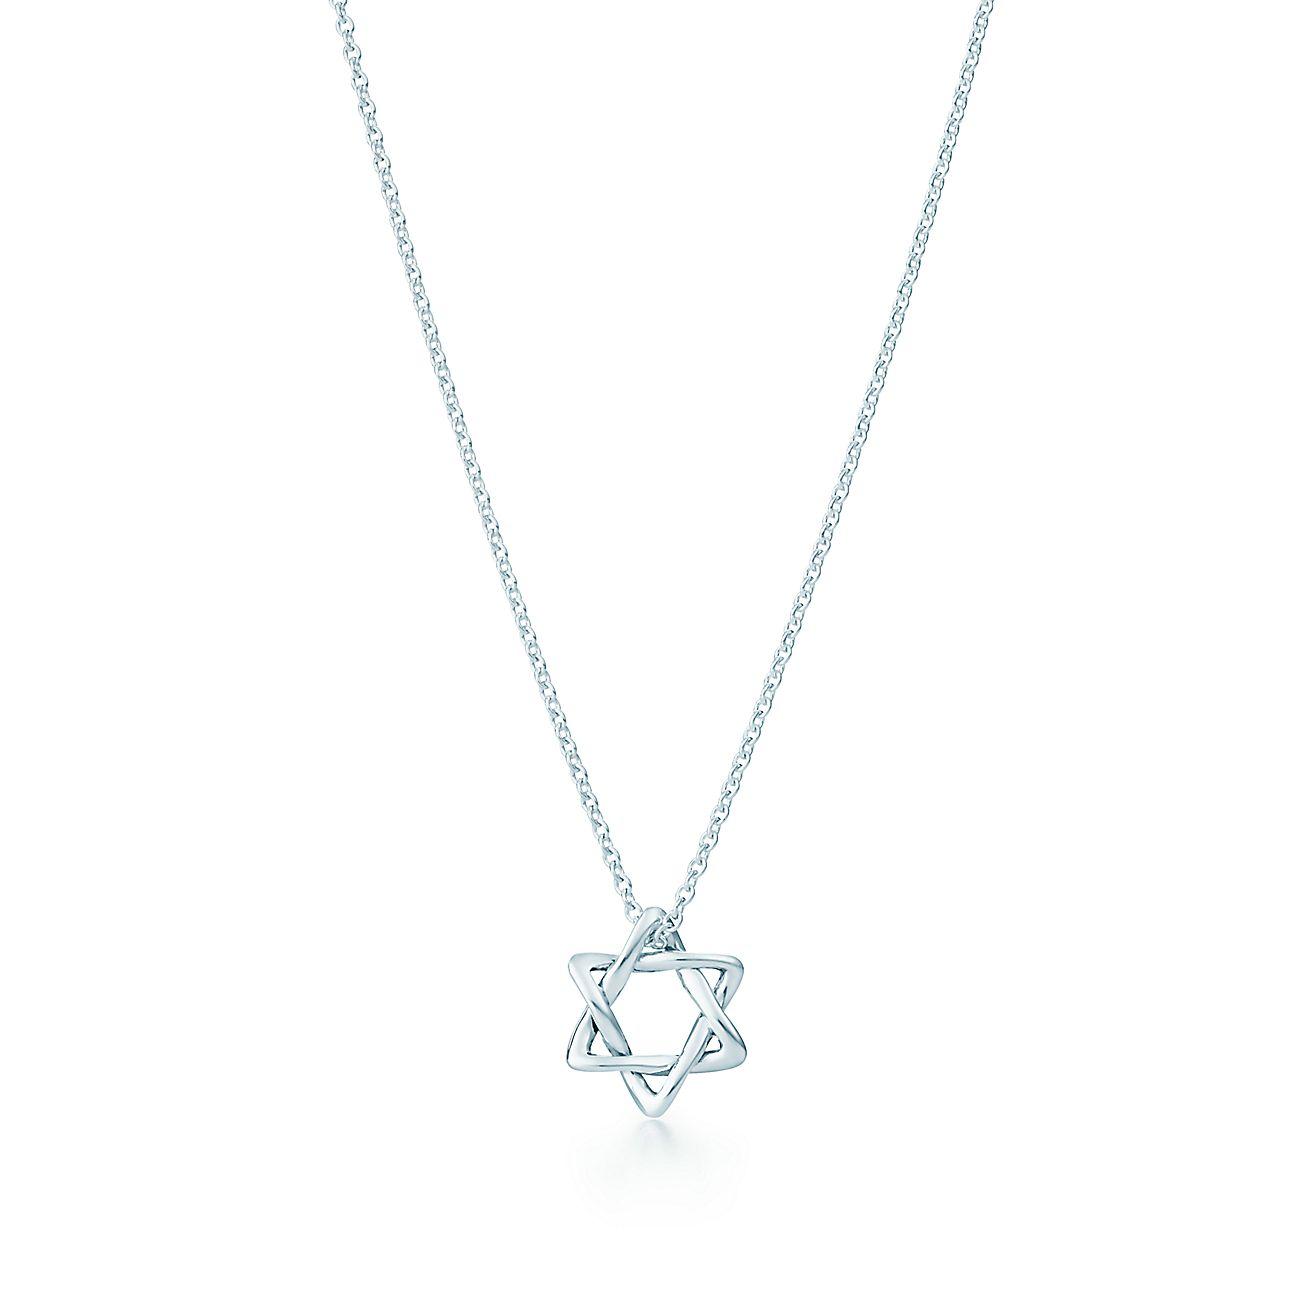 Elsa peretti star of david pendant elsa peretti star of david pendant in sterling silver 12 mm wide tiffany co aloadofball Choice Image